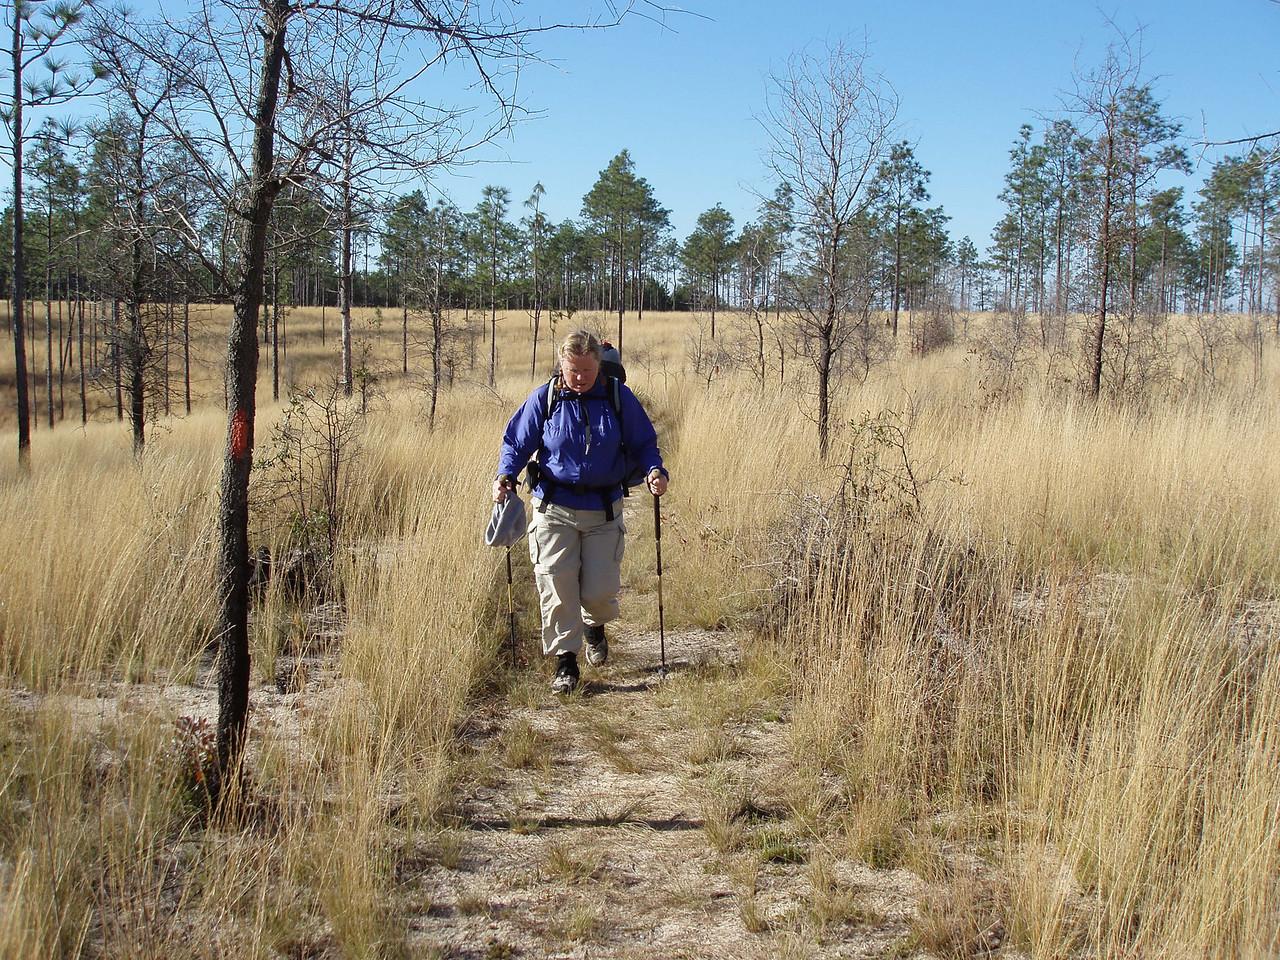 Econfina Prairie<br /> PHOTO CREDIT: Robert Coveney / Florida Trail Association